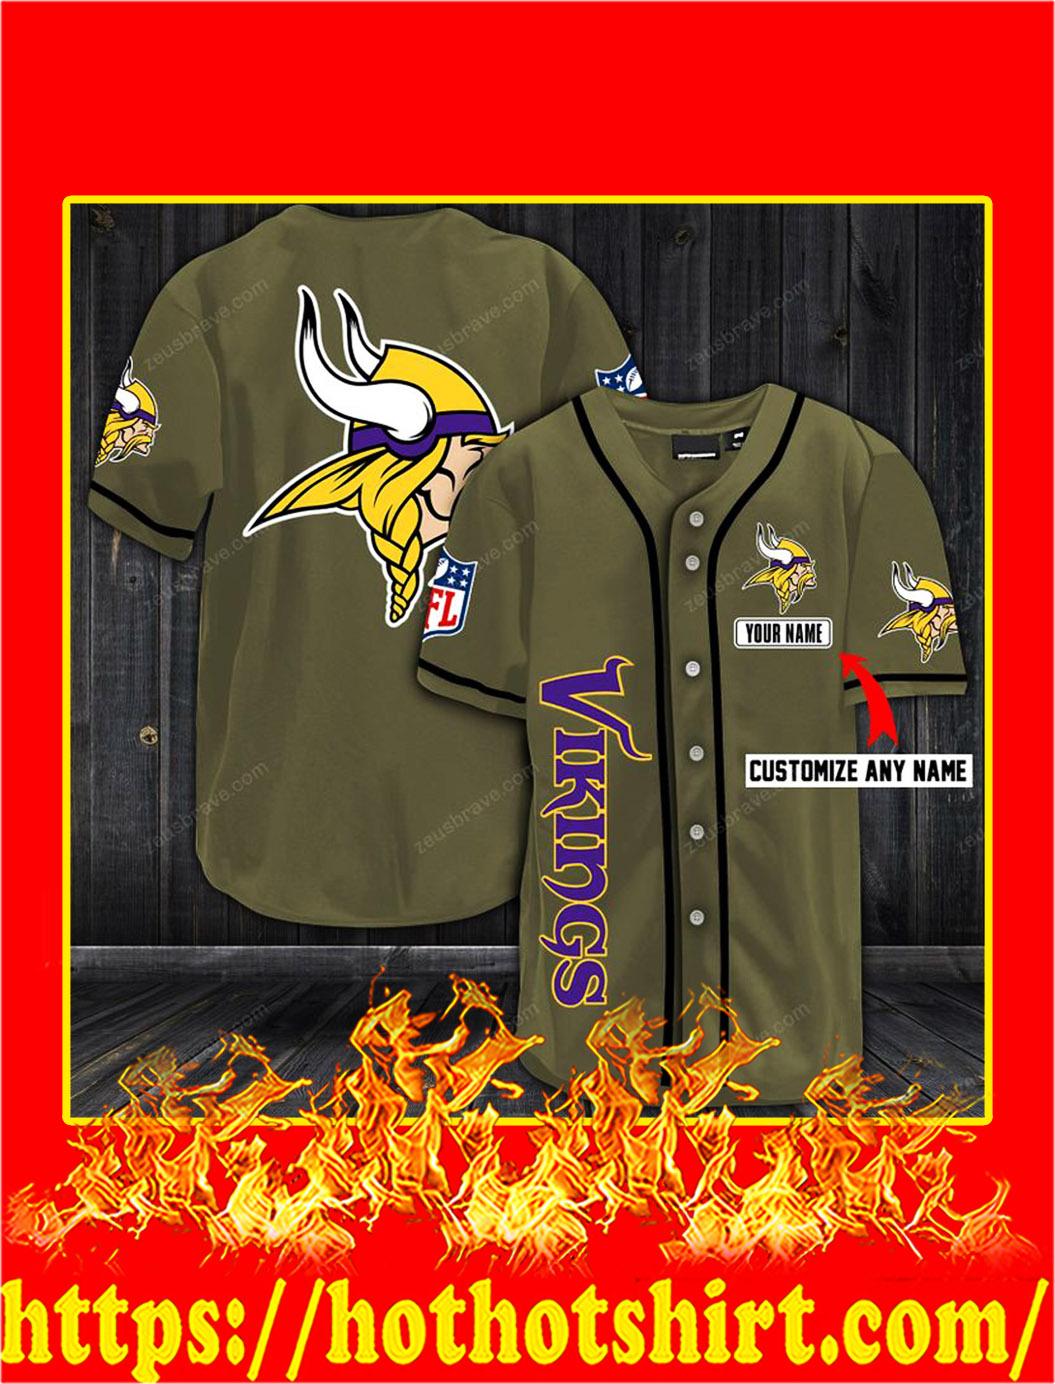 Customize name minnesota vikings hawaiian shirt- old gold